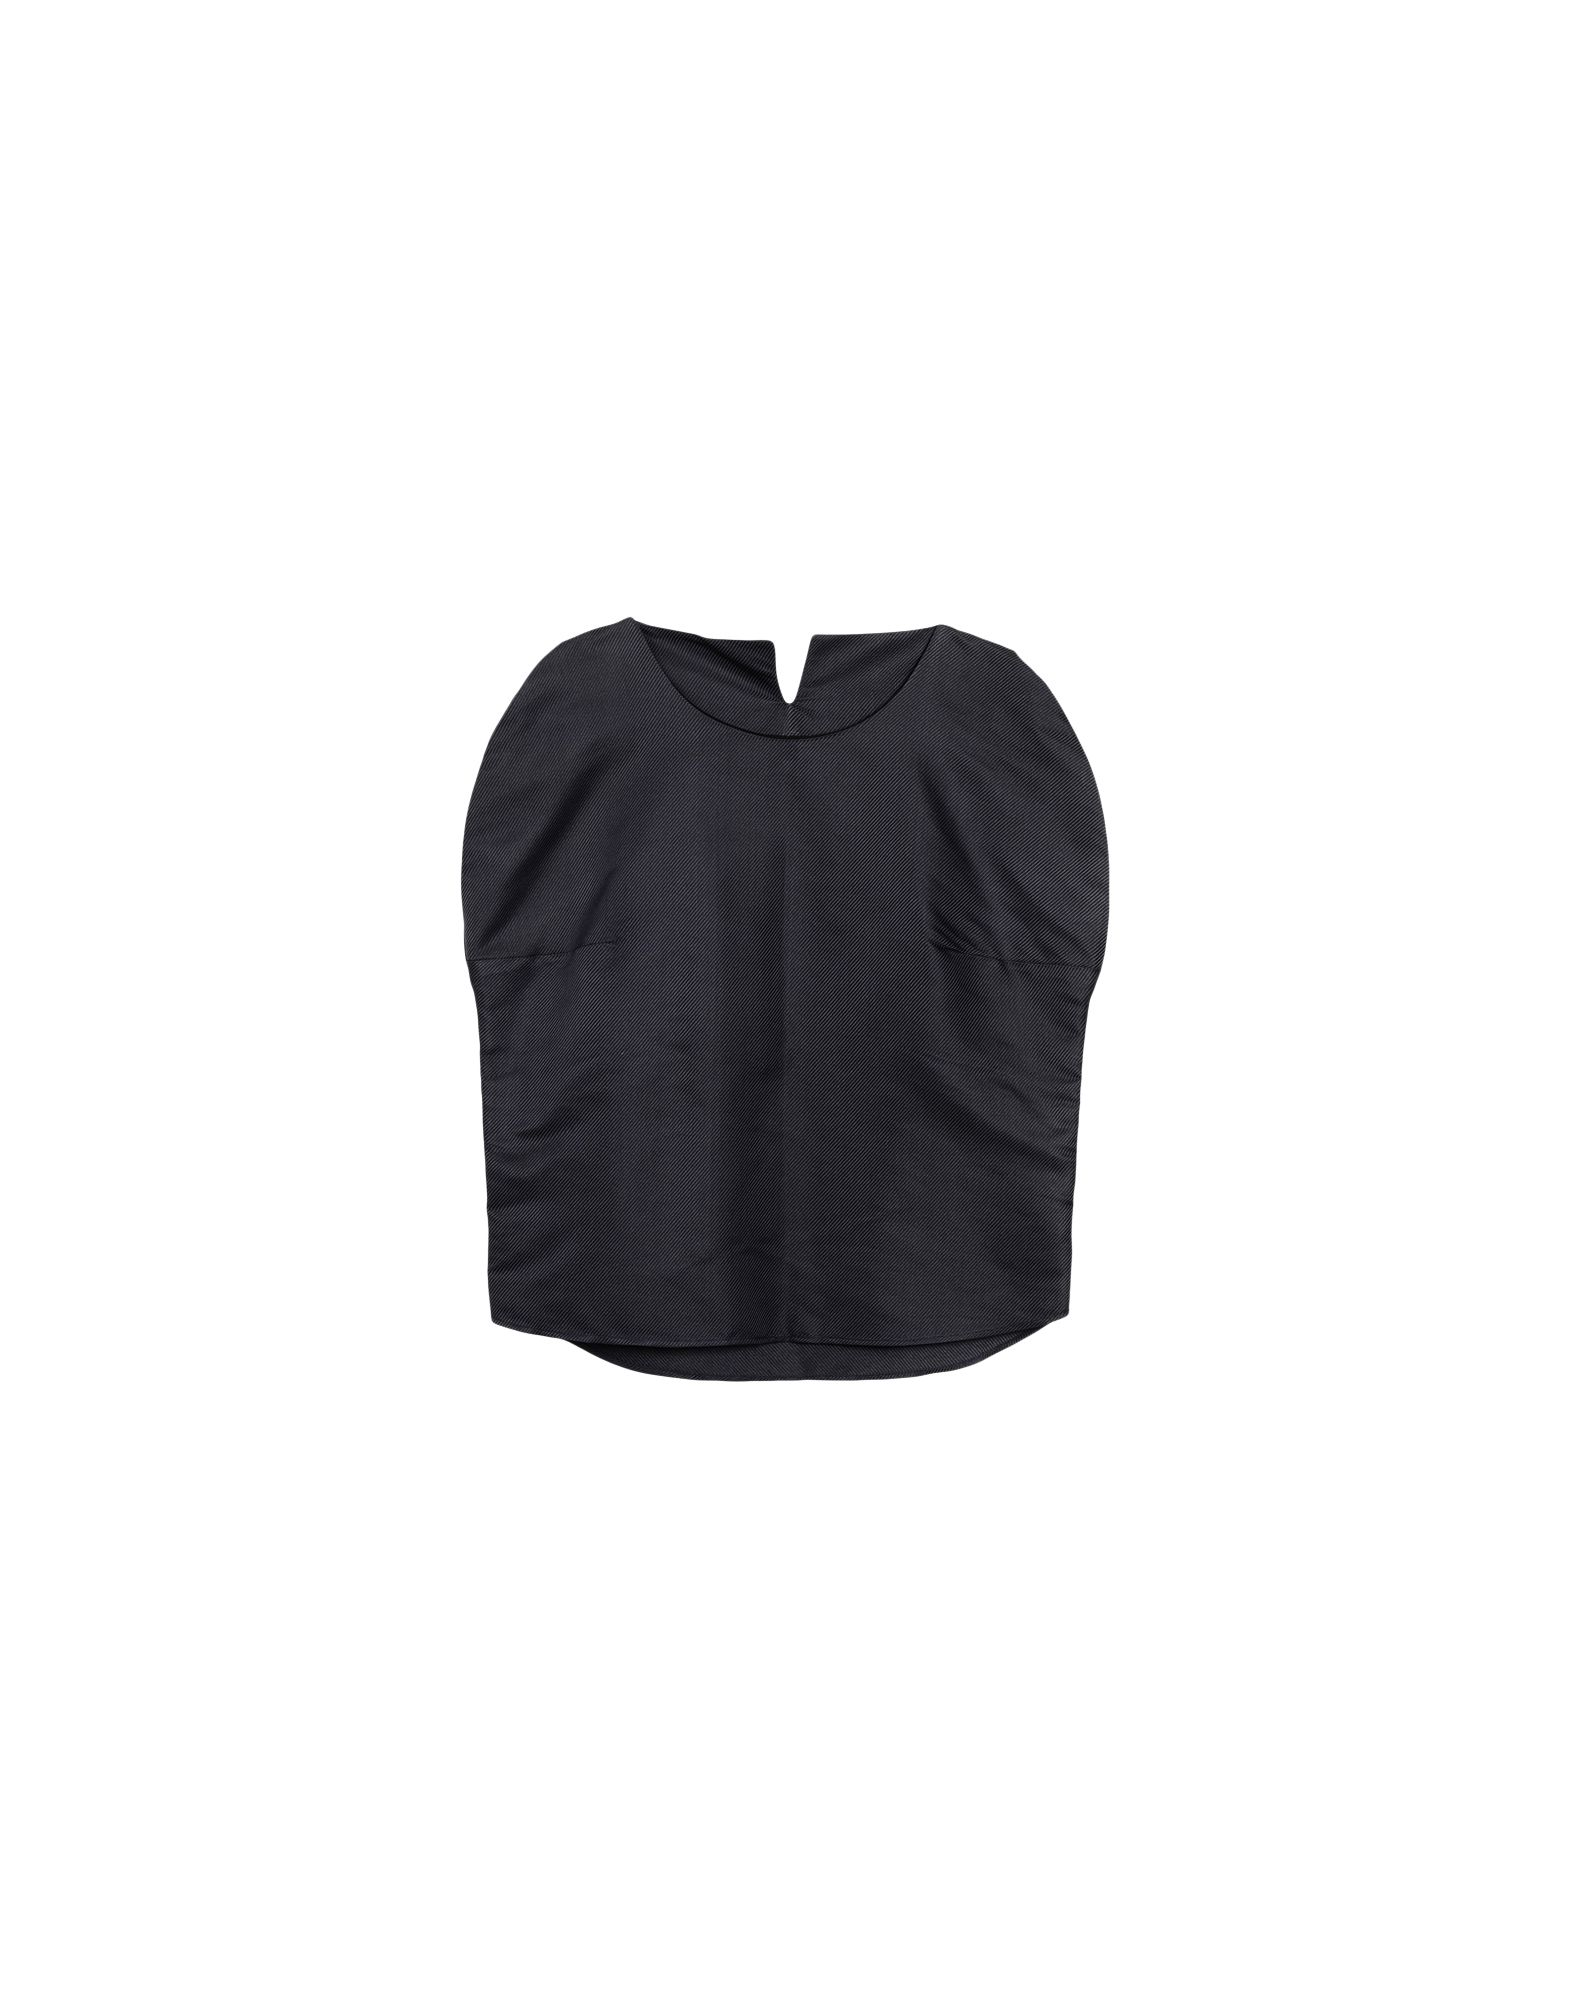 JASMIN SHOKRIAN Silk Top in Slate Blue